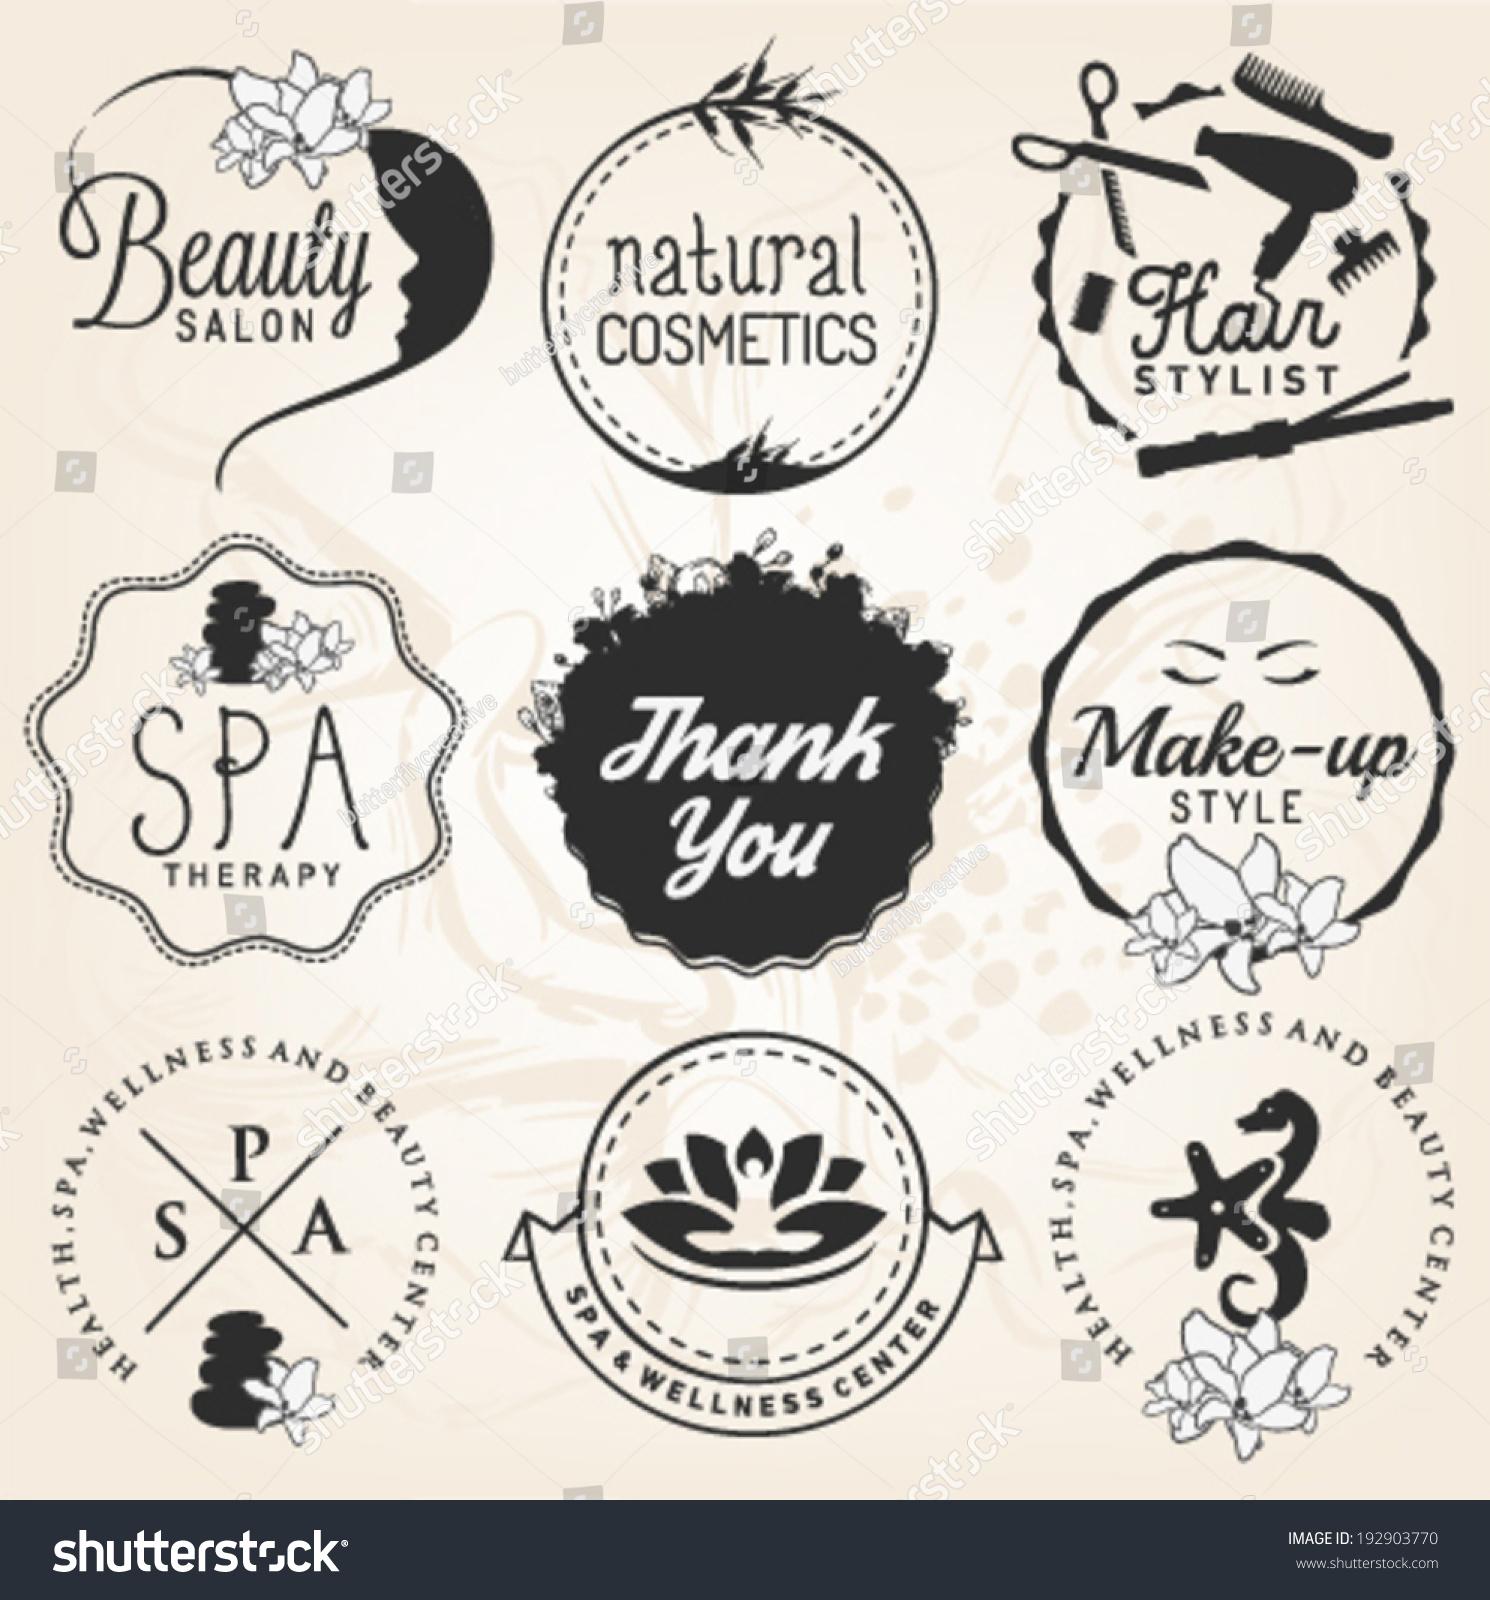 Beauty salon spa wellness design elements stock vector for 4 elements salon